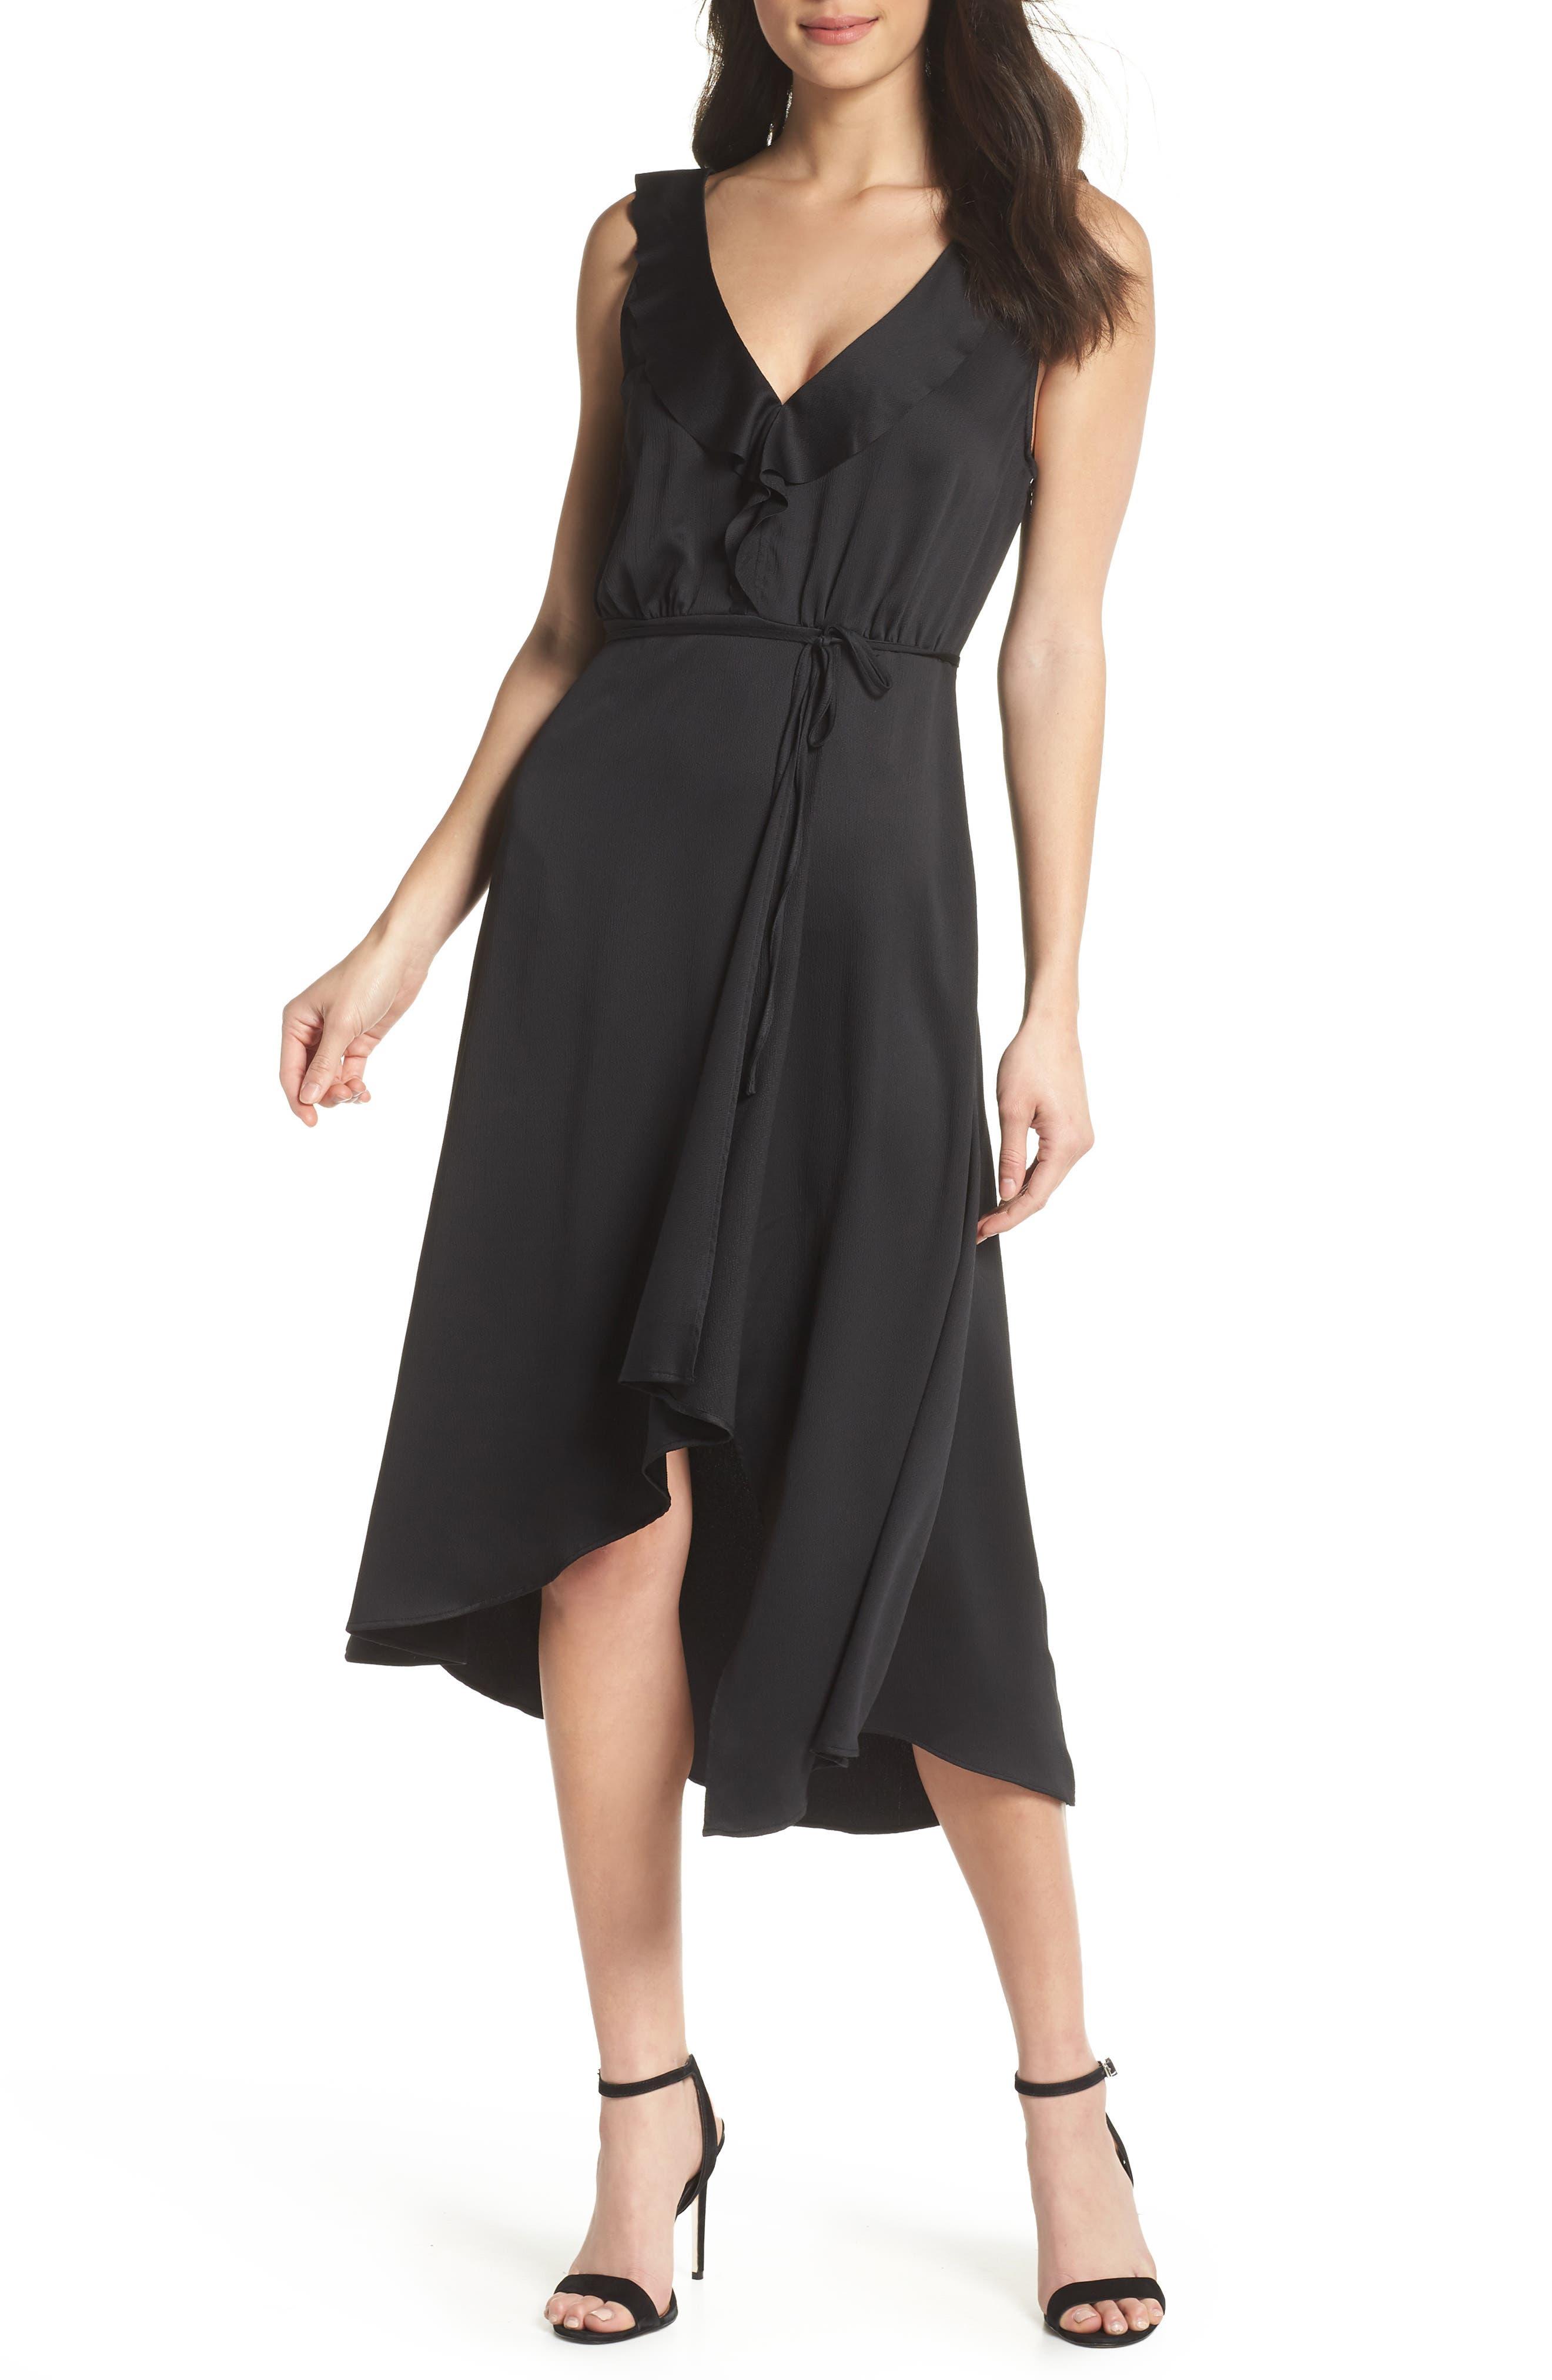 Maudie Ruffle Midi Dress,                             Main thumbnail 1, color,                             Black